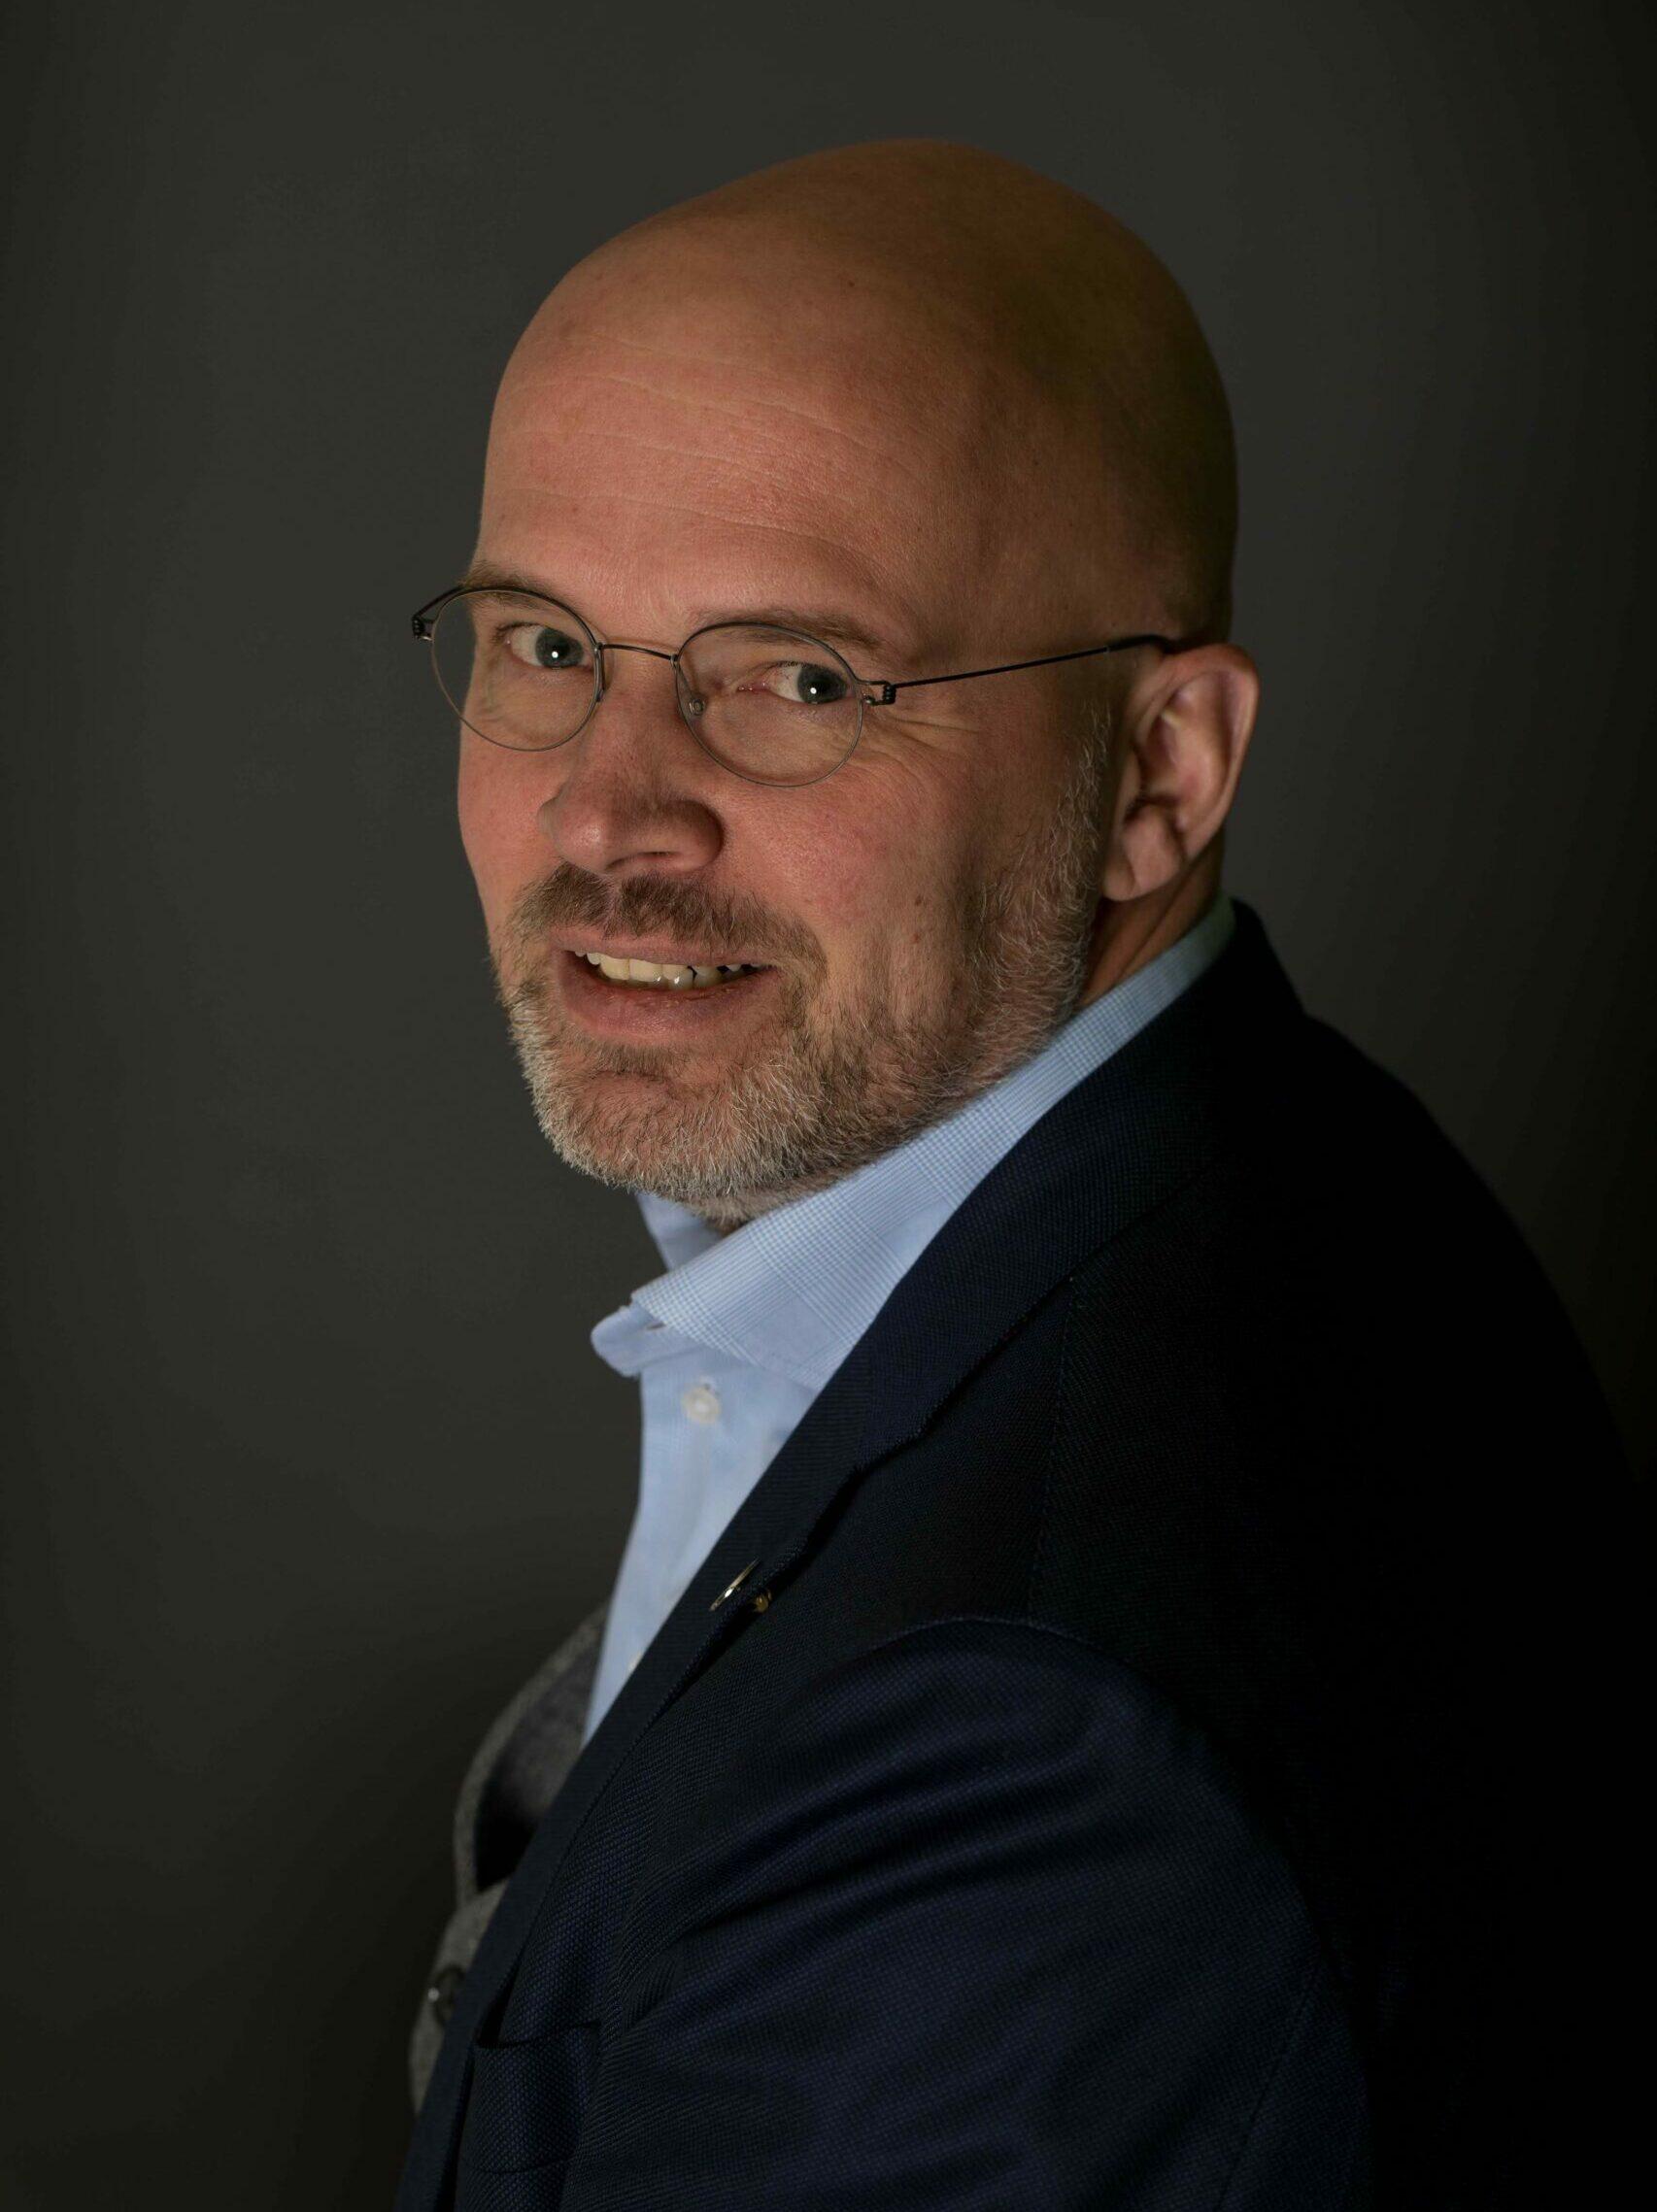 Erik Van Berkel